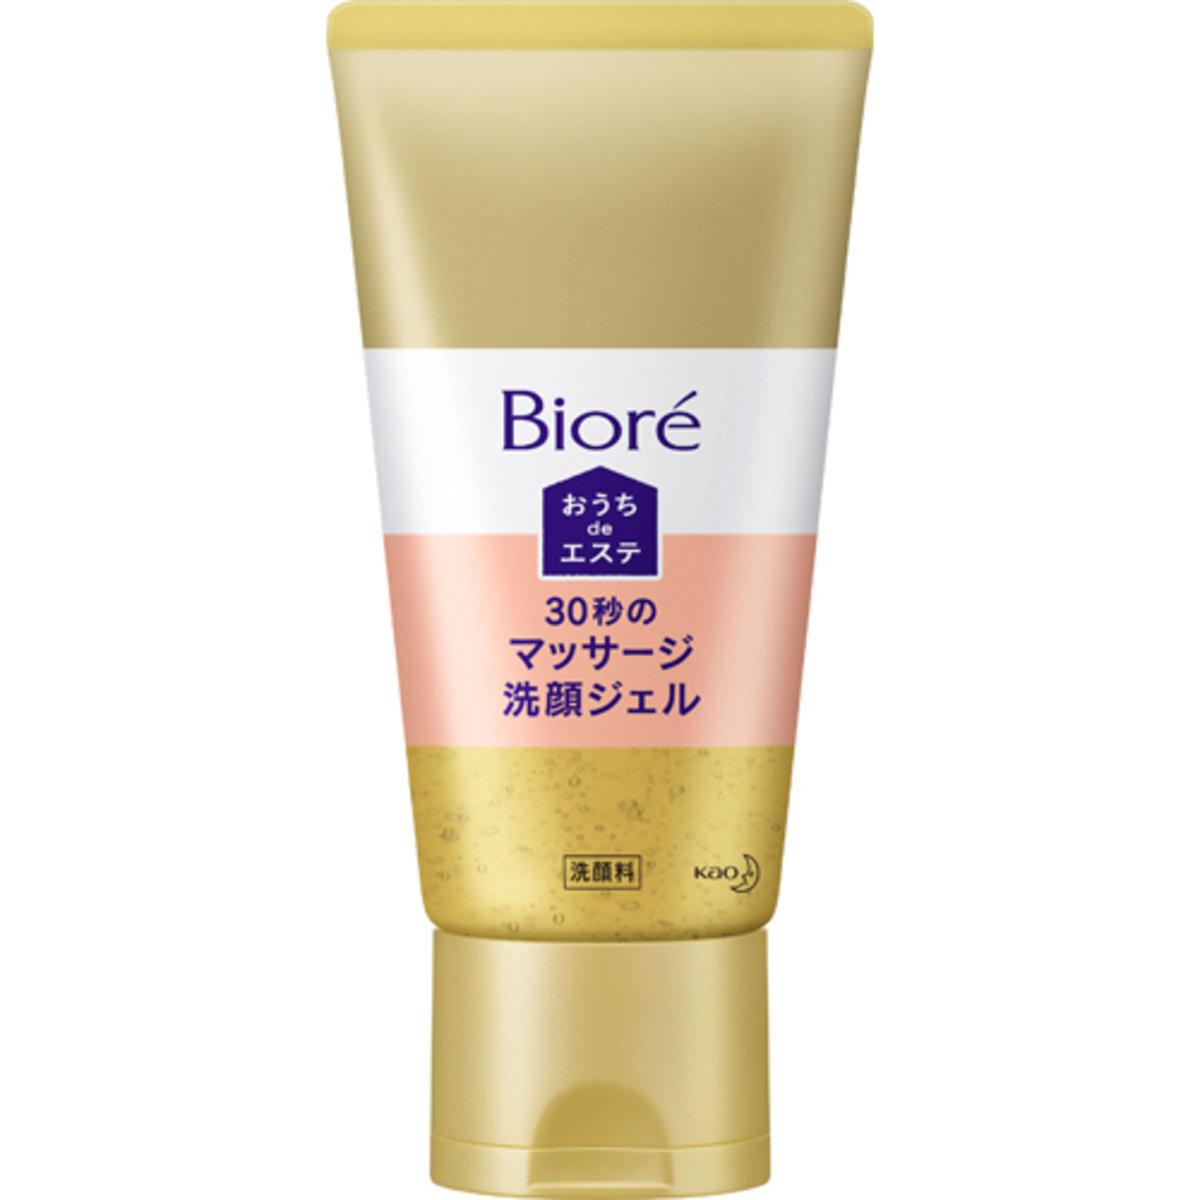 KAO BIORE 30 SEC massage  Gentle cleansing Gel(Parallel import)